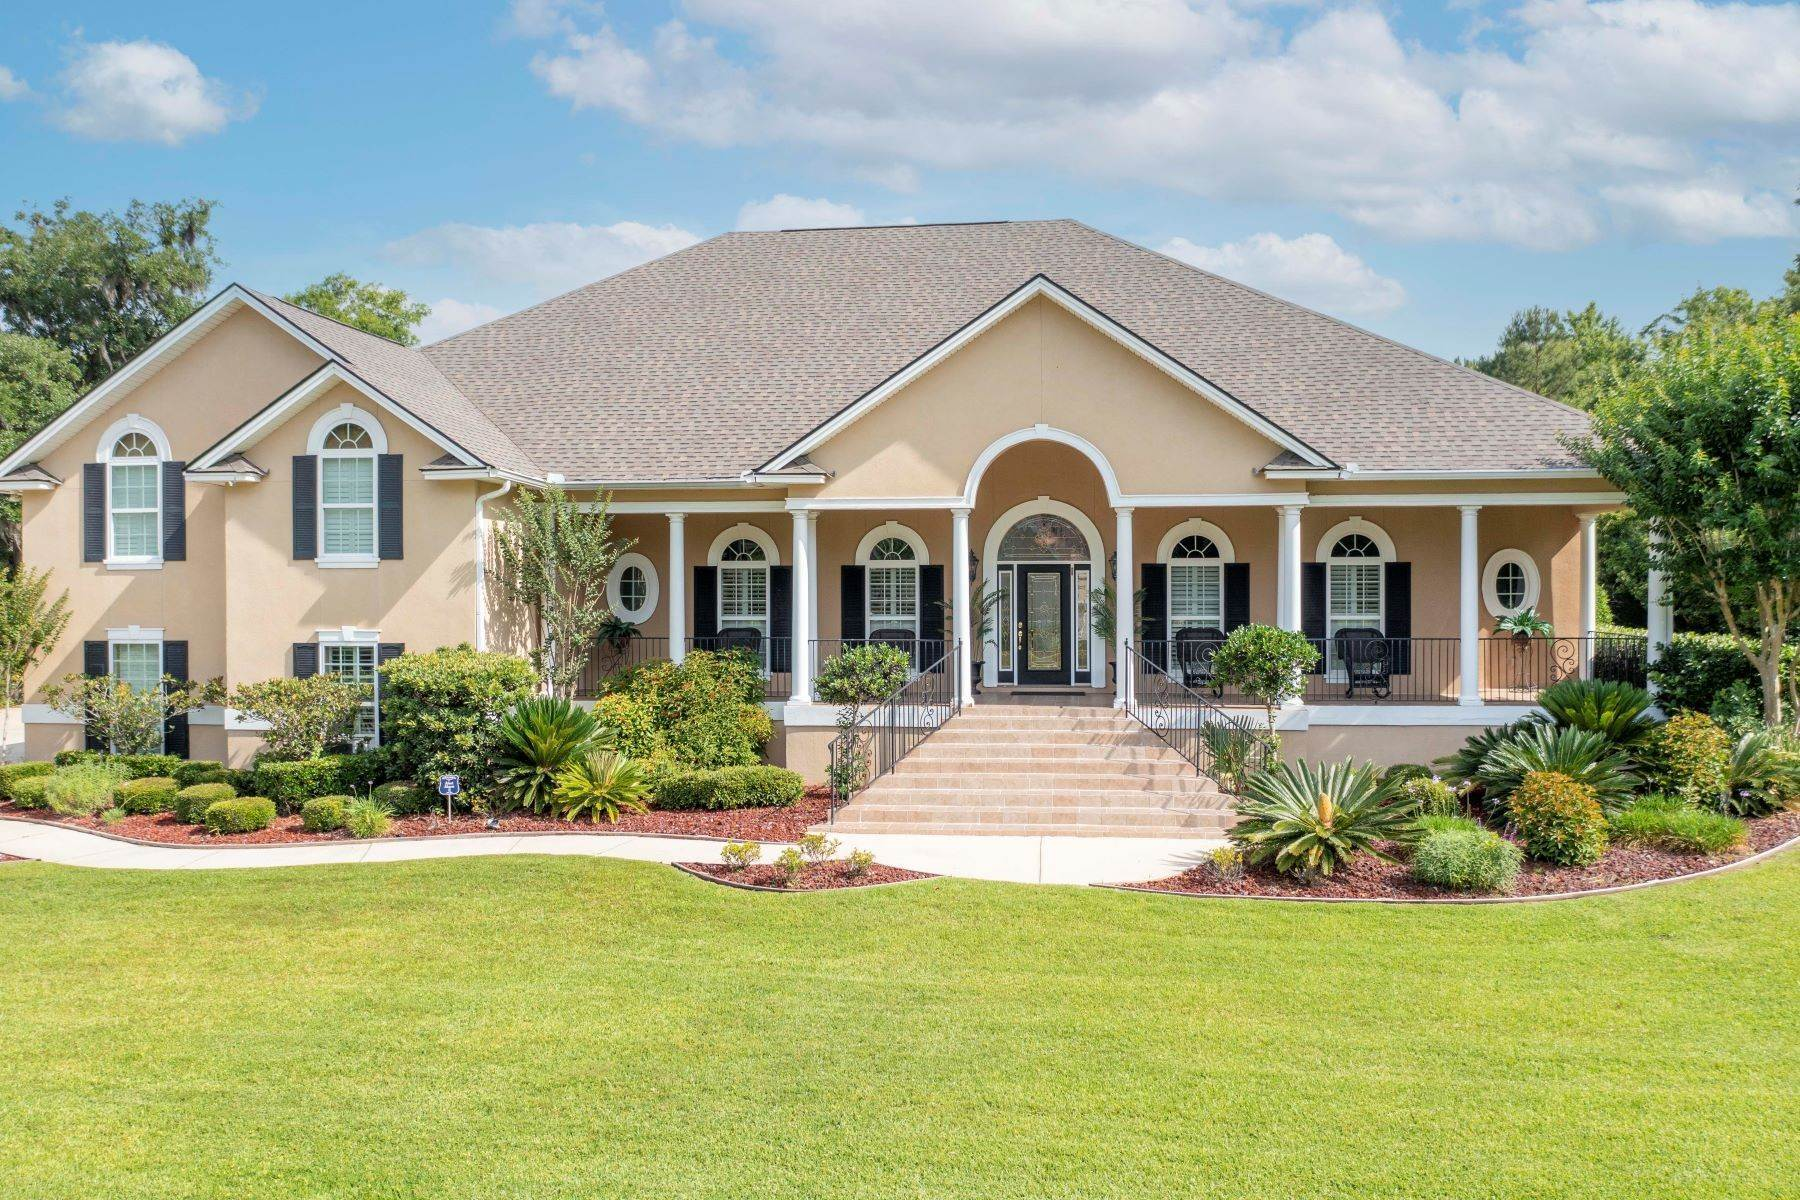 102 Shipmaster Drive Brunswick Ga Luxury Home For Sale